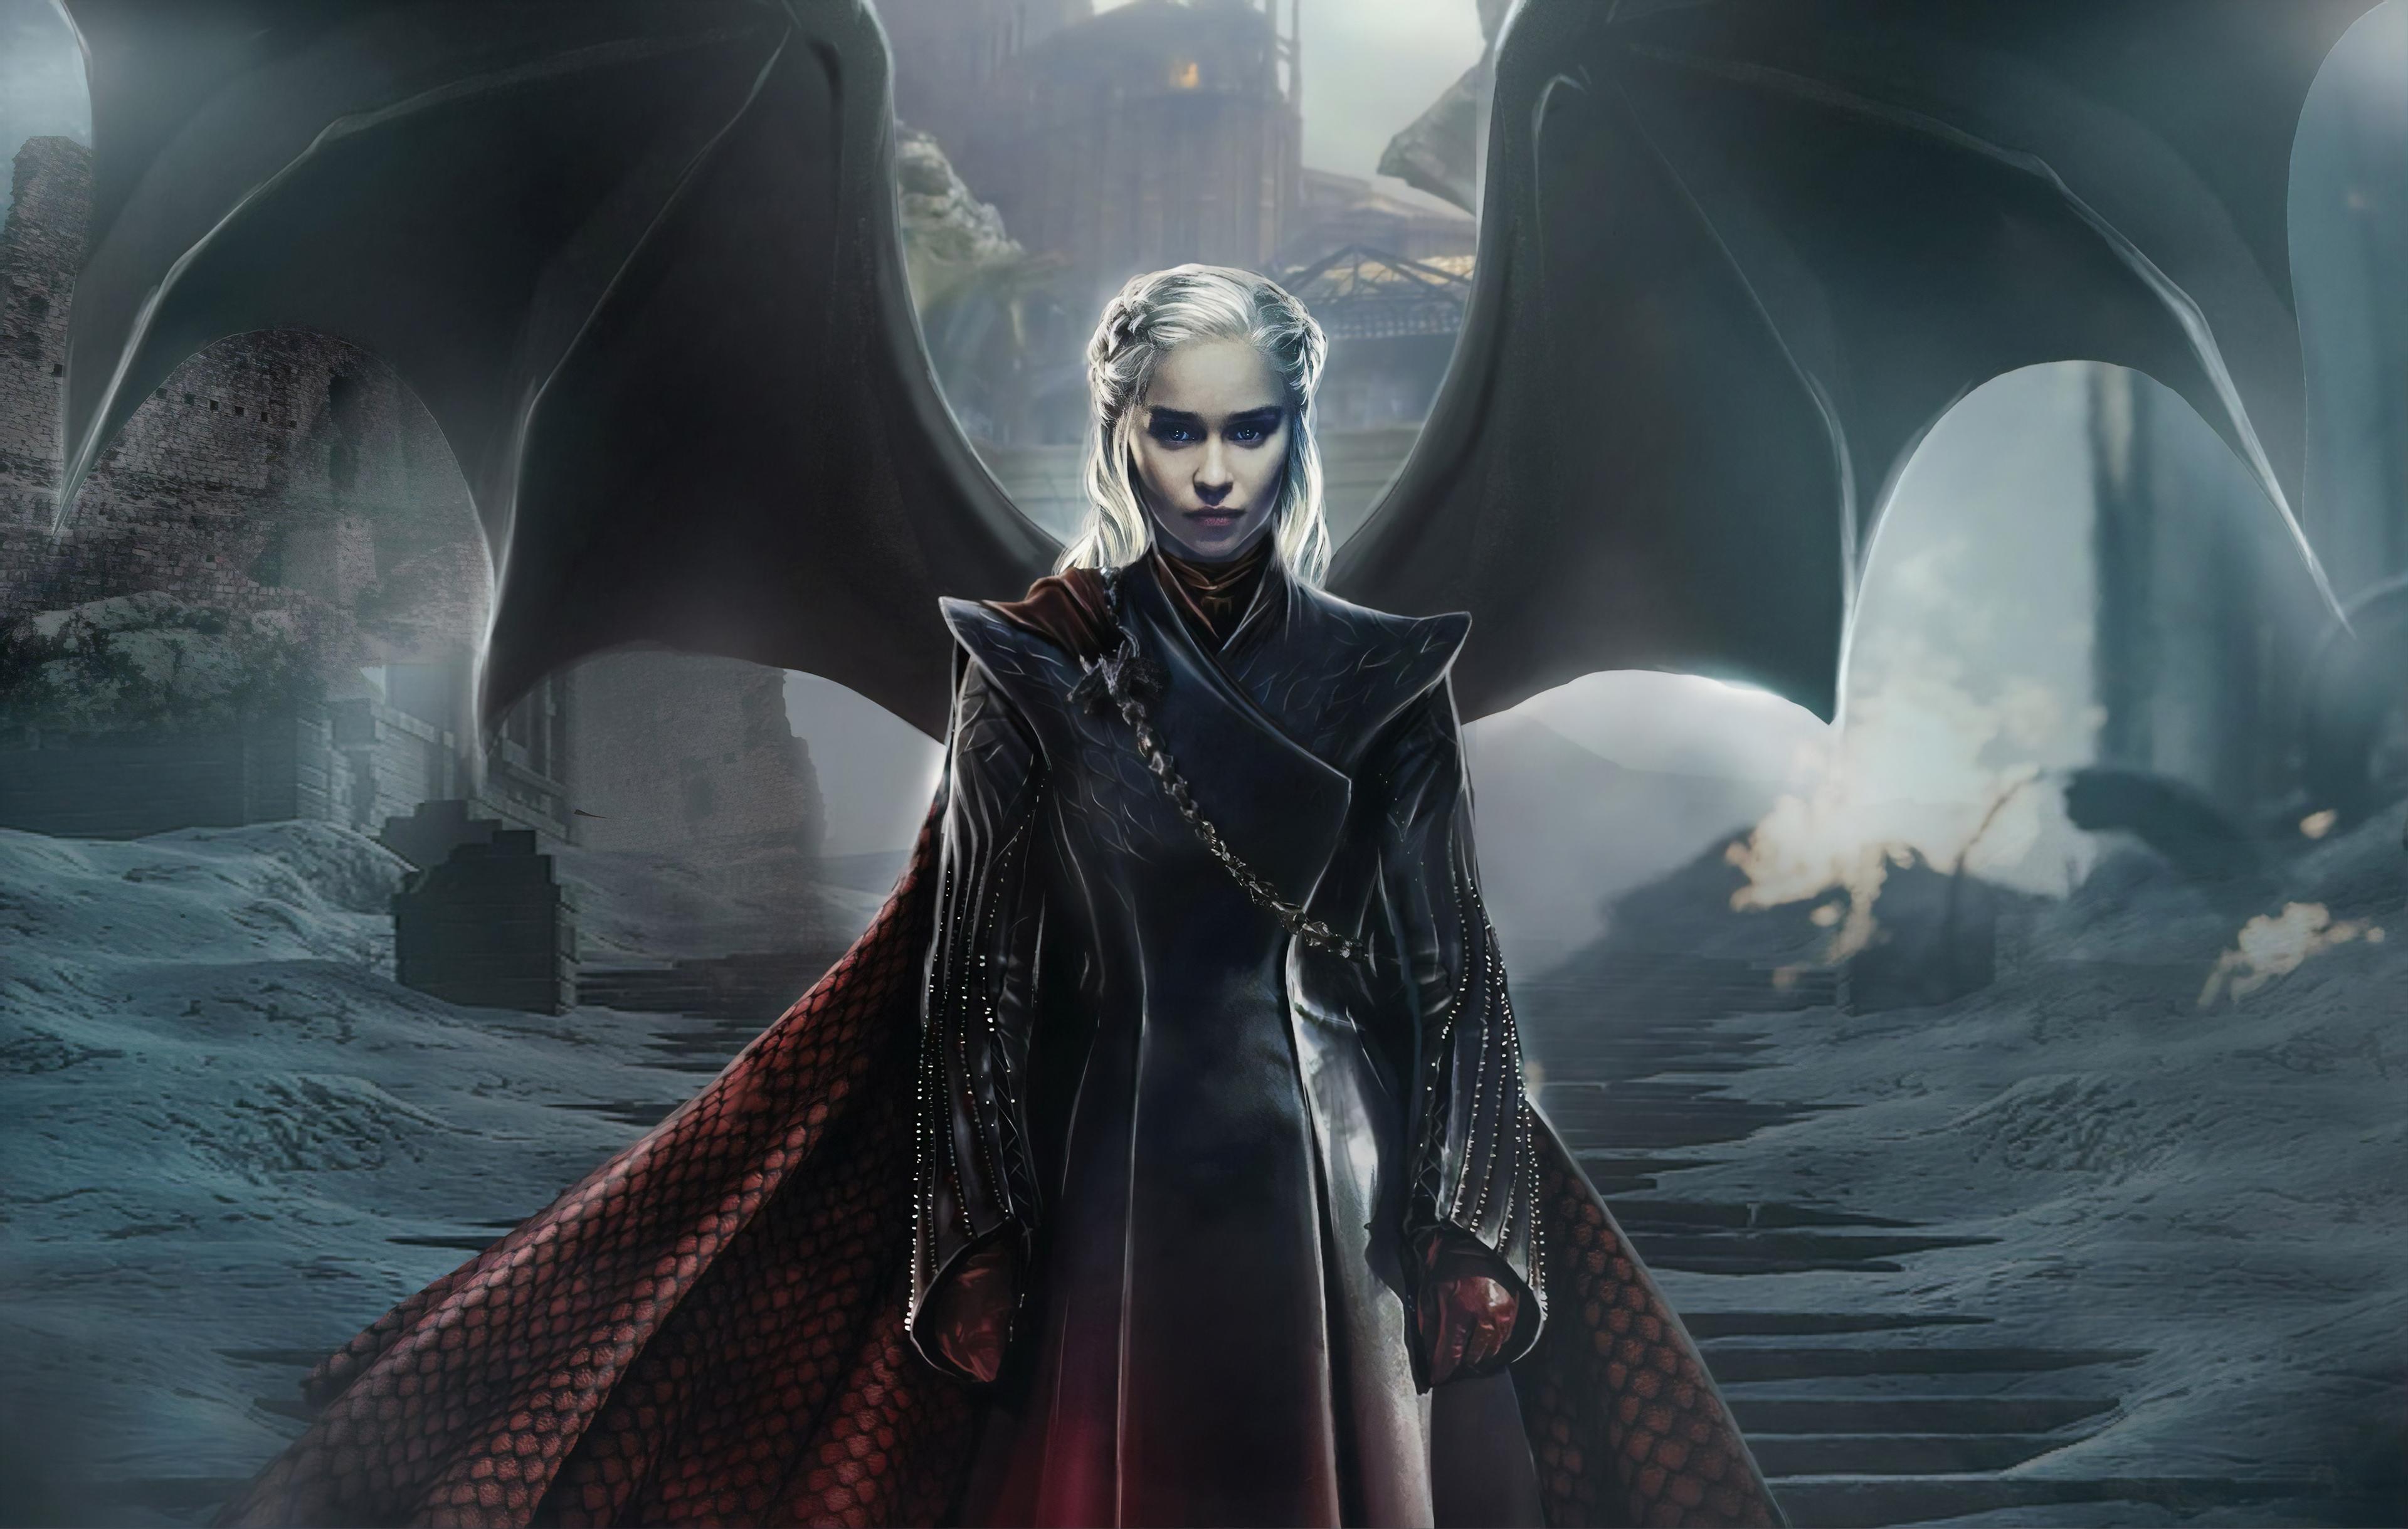 Daenerys Dragon wings Wallpaper   [3840x2438 3840x2438